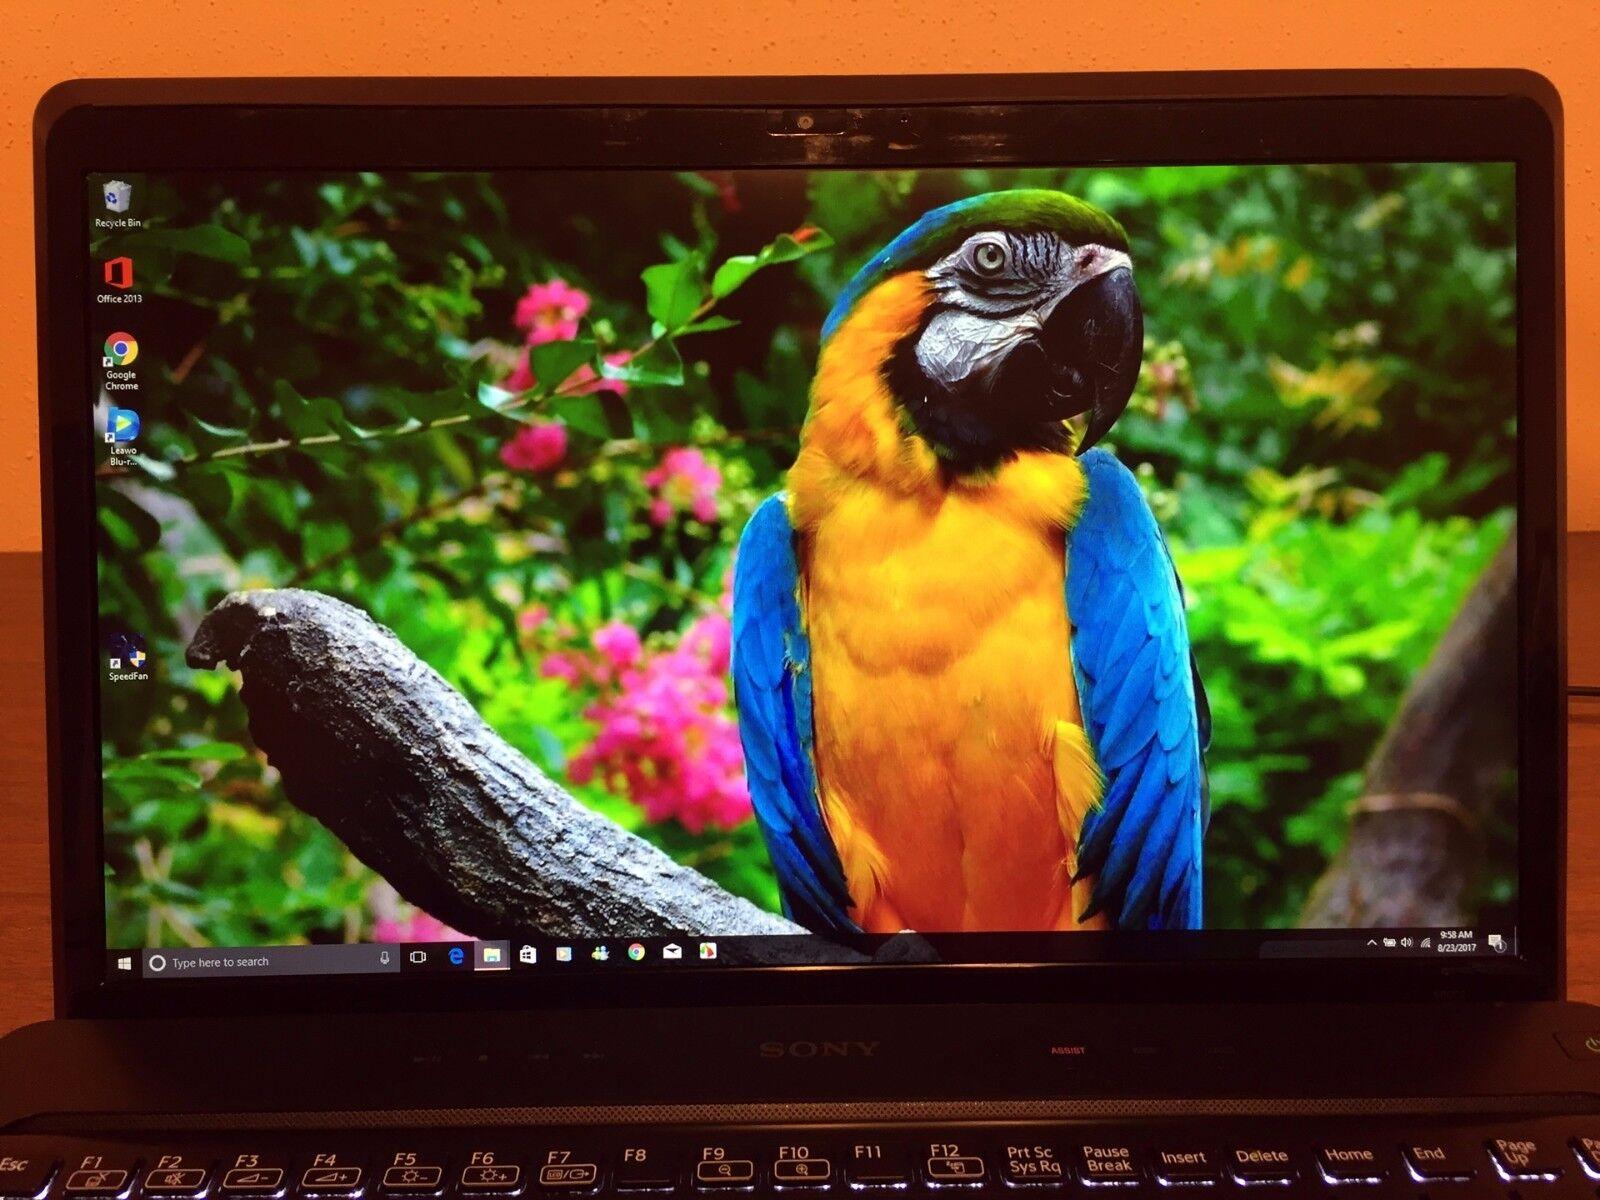 "Sony VAIO VPCF2 ✔16.4"" 1080P✔ i7-2670QM✔ 640 HDD✔ 8GB Ram ✔1GB GPU✔BluRay ✔Win10"